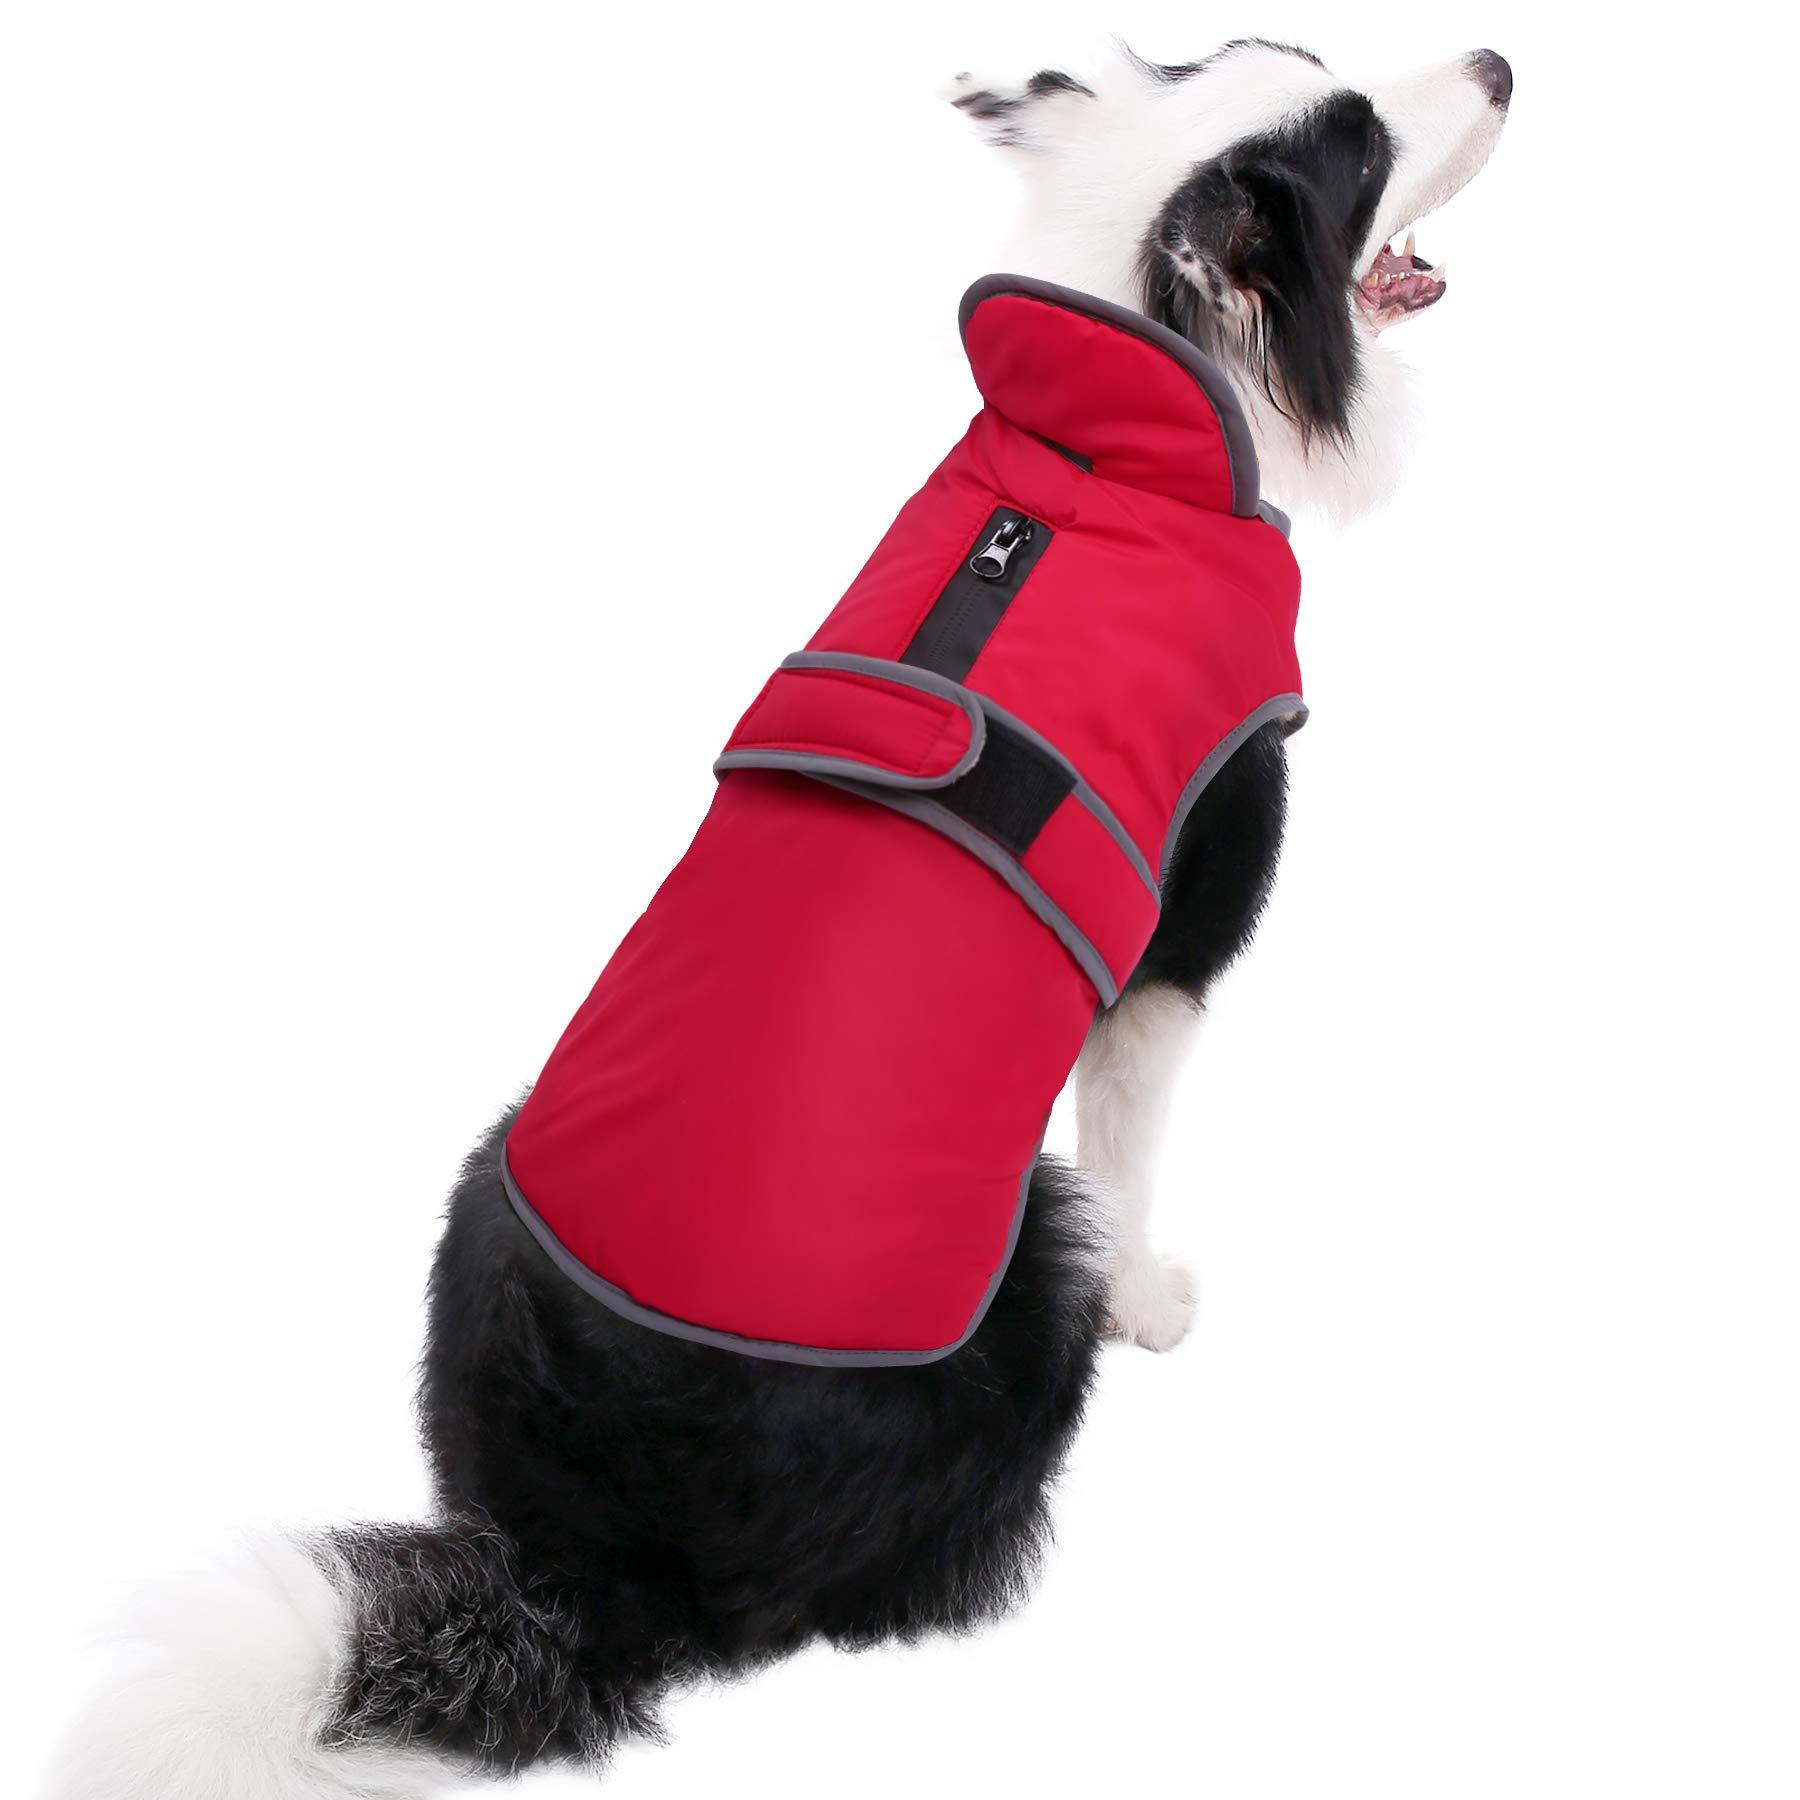 MIGOHI Reflective Waterproof Windproof Dog Coat Cold Weather Warm Dog Jacket Reversible Stormguard Design Winter Dog Vest for Small Medium Large Dogs Red XXL